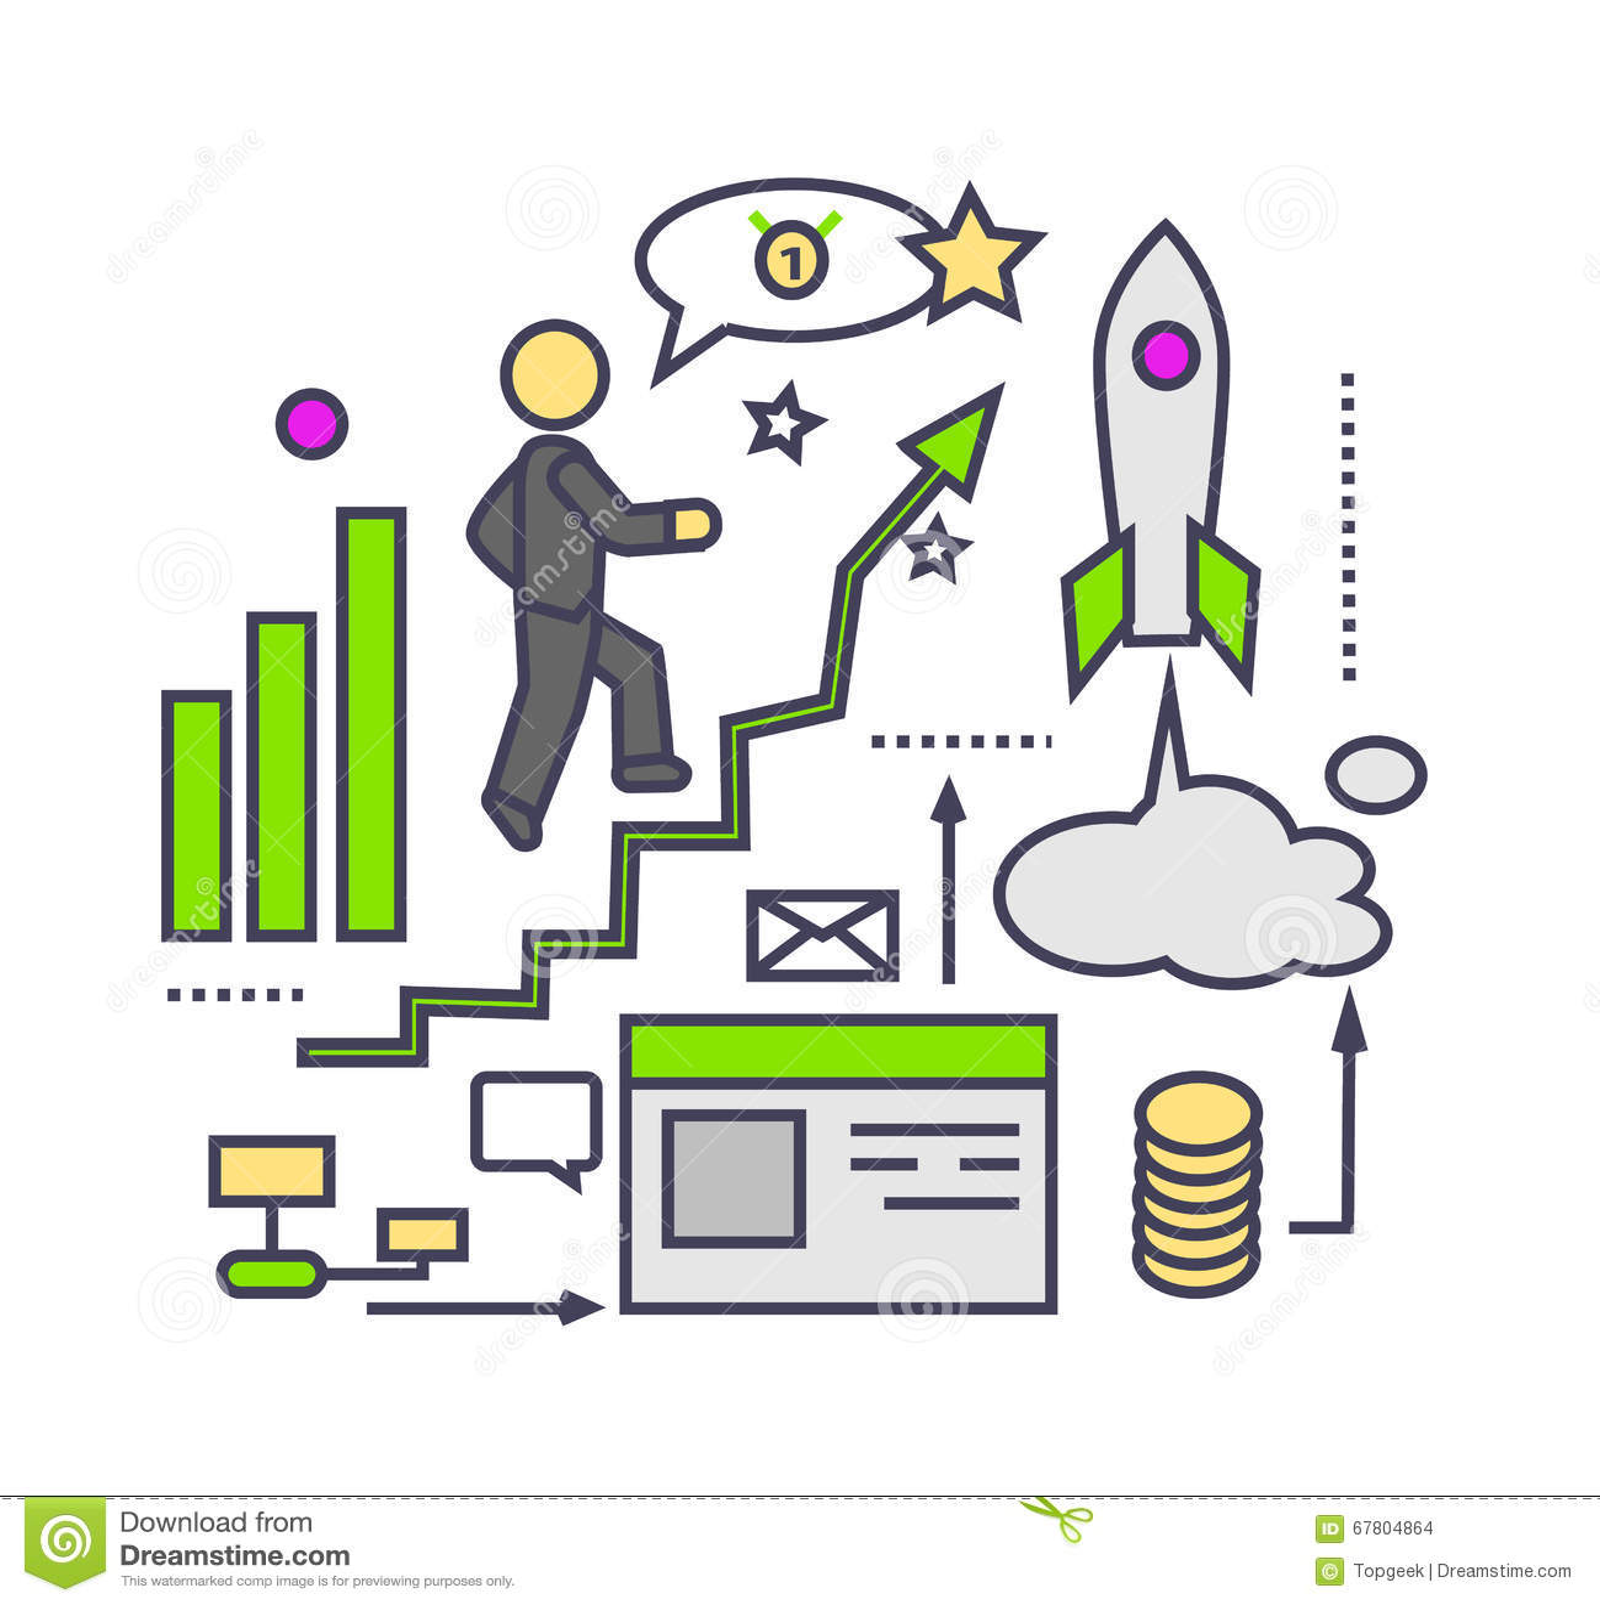 Business Development Icon : Icon flat style design successful startup stock vector